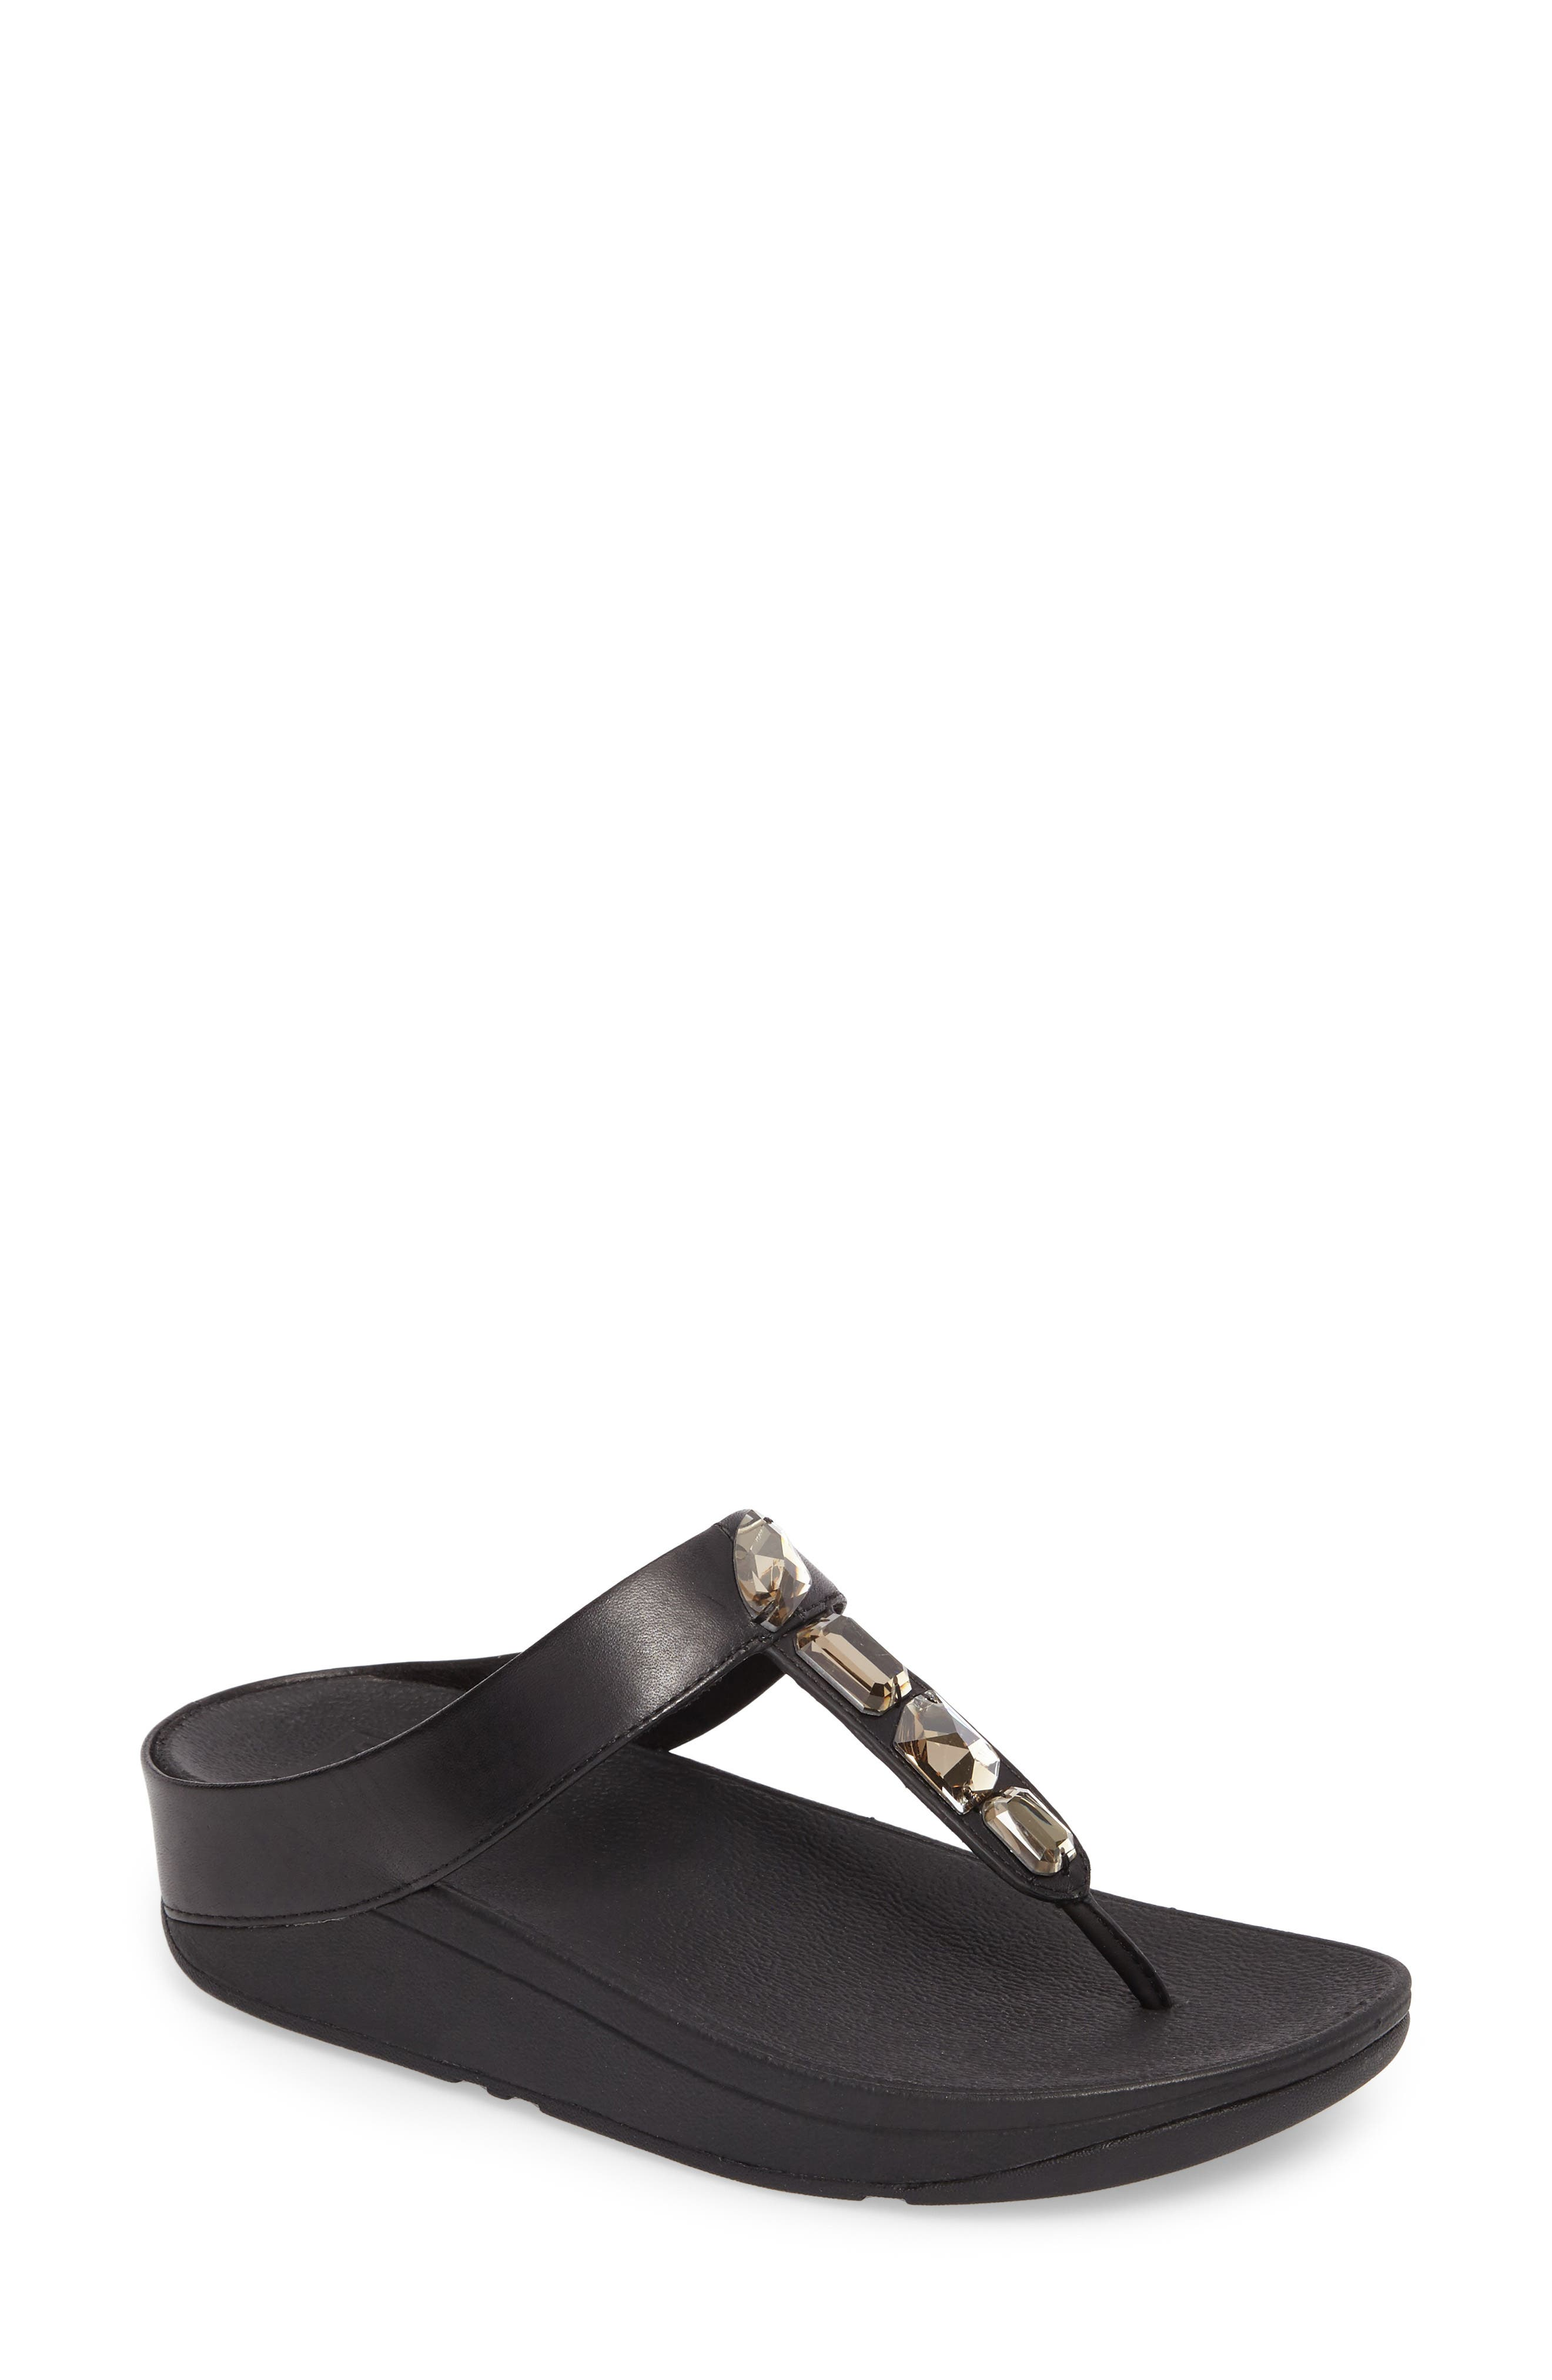 Roka Sandal,                         Main,                         color, Black